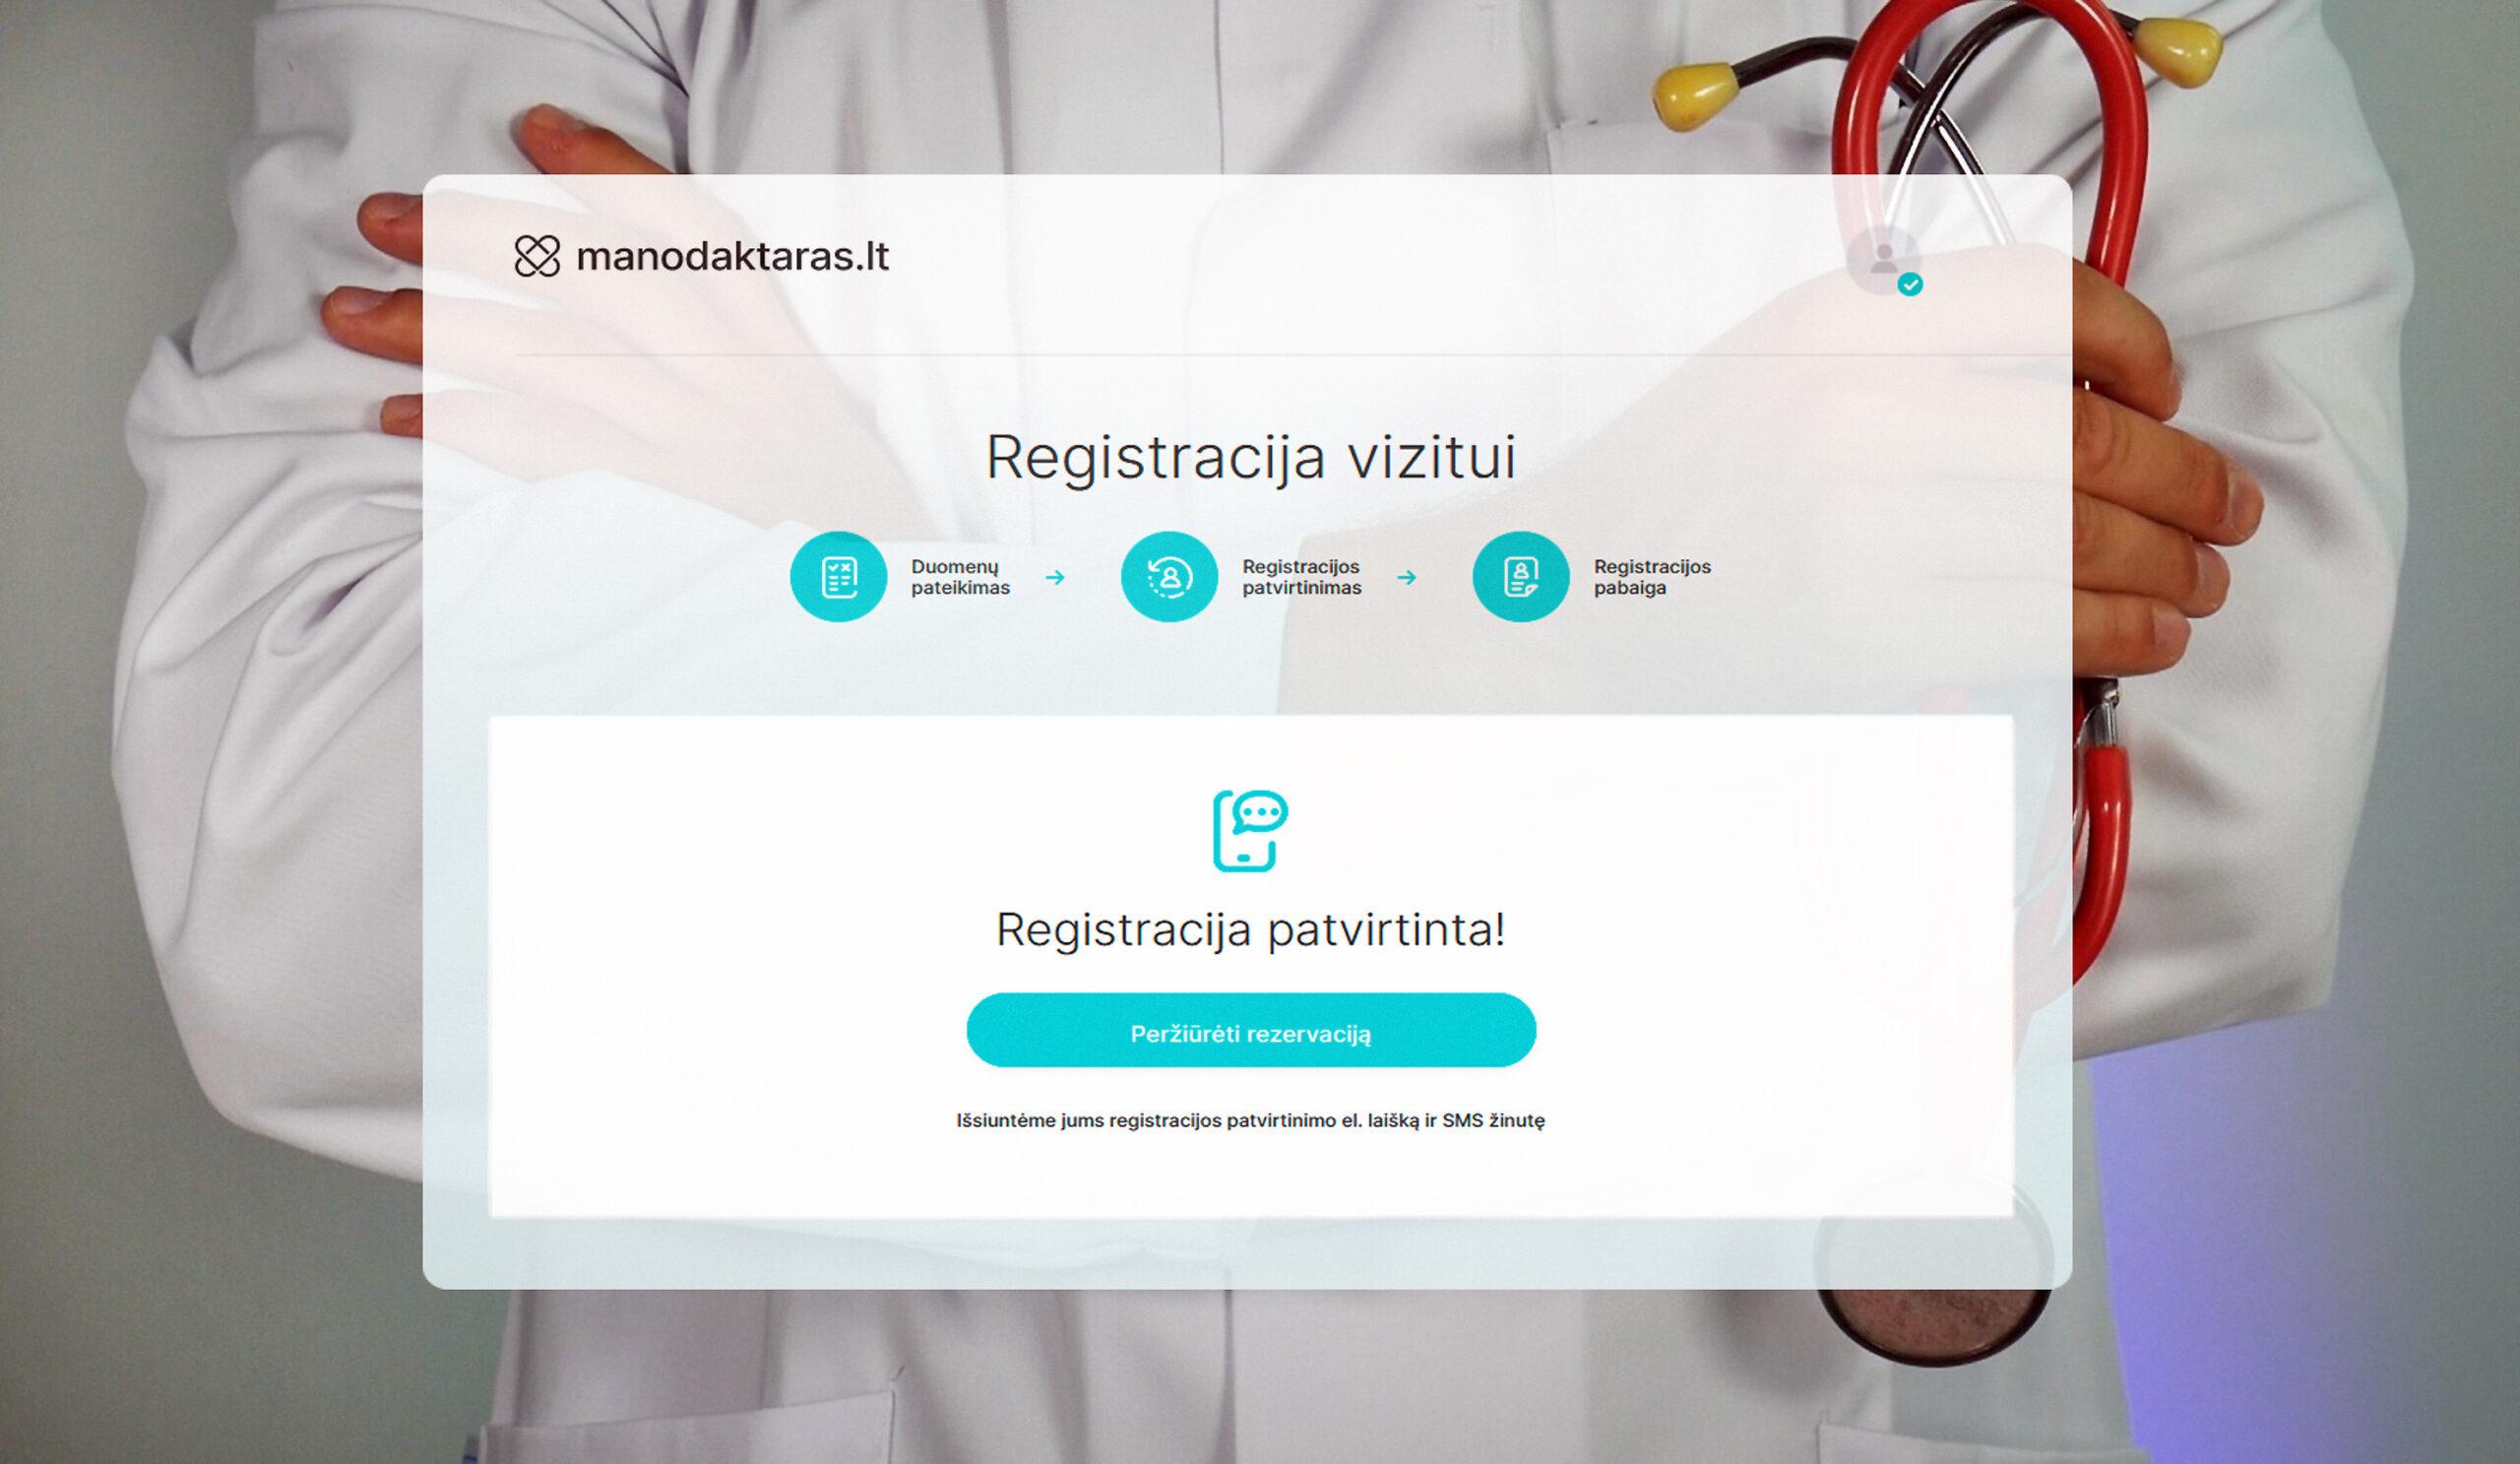 Mano daktaras registracija